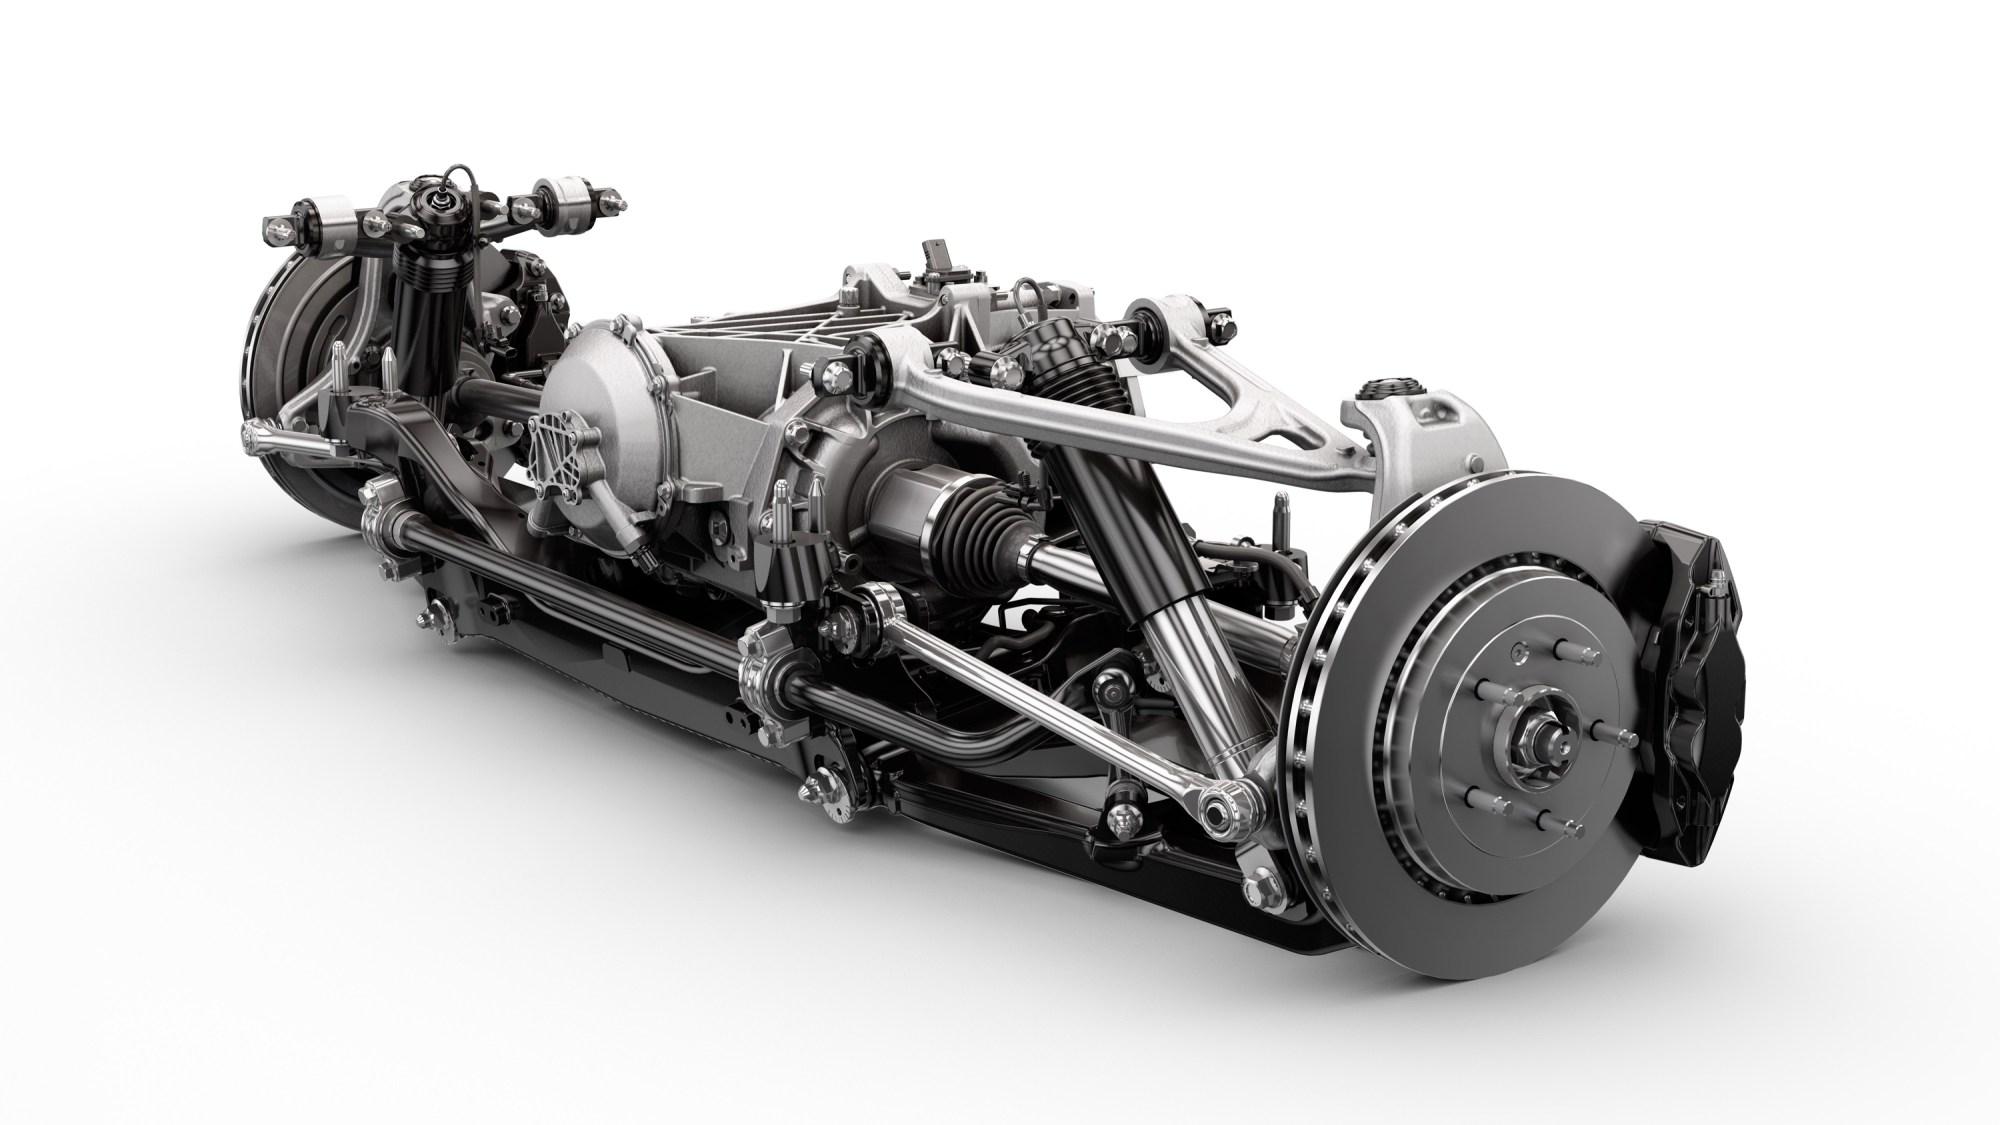 hight resolution of corvette c7 engine diagram wiring diagram yer c7 corvette engine diagram